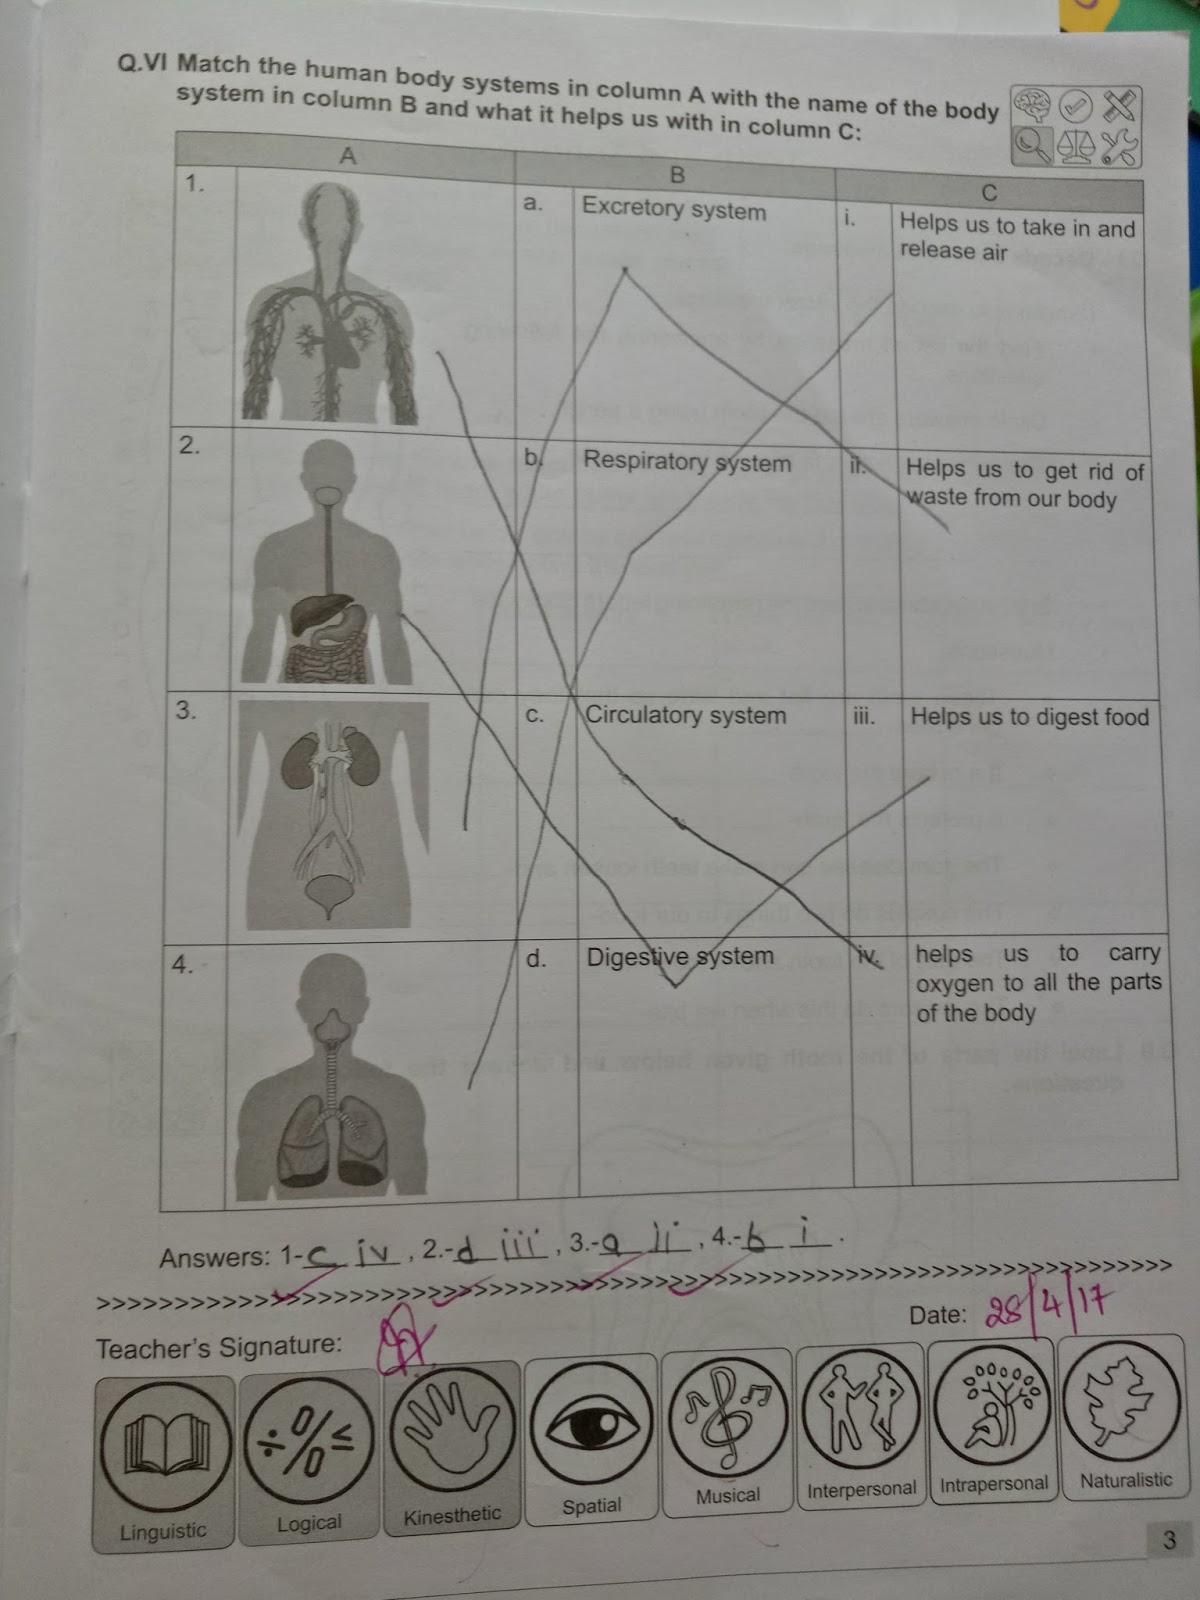 Pis Vadodara Std 4 Evs Human Body Systems Workbook And